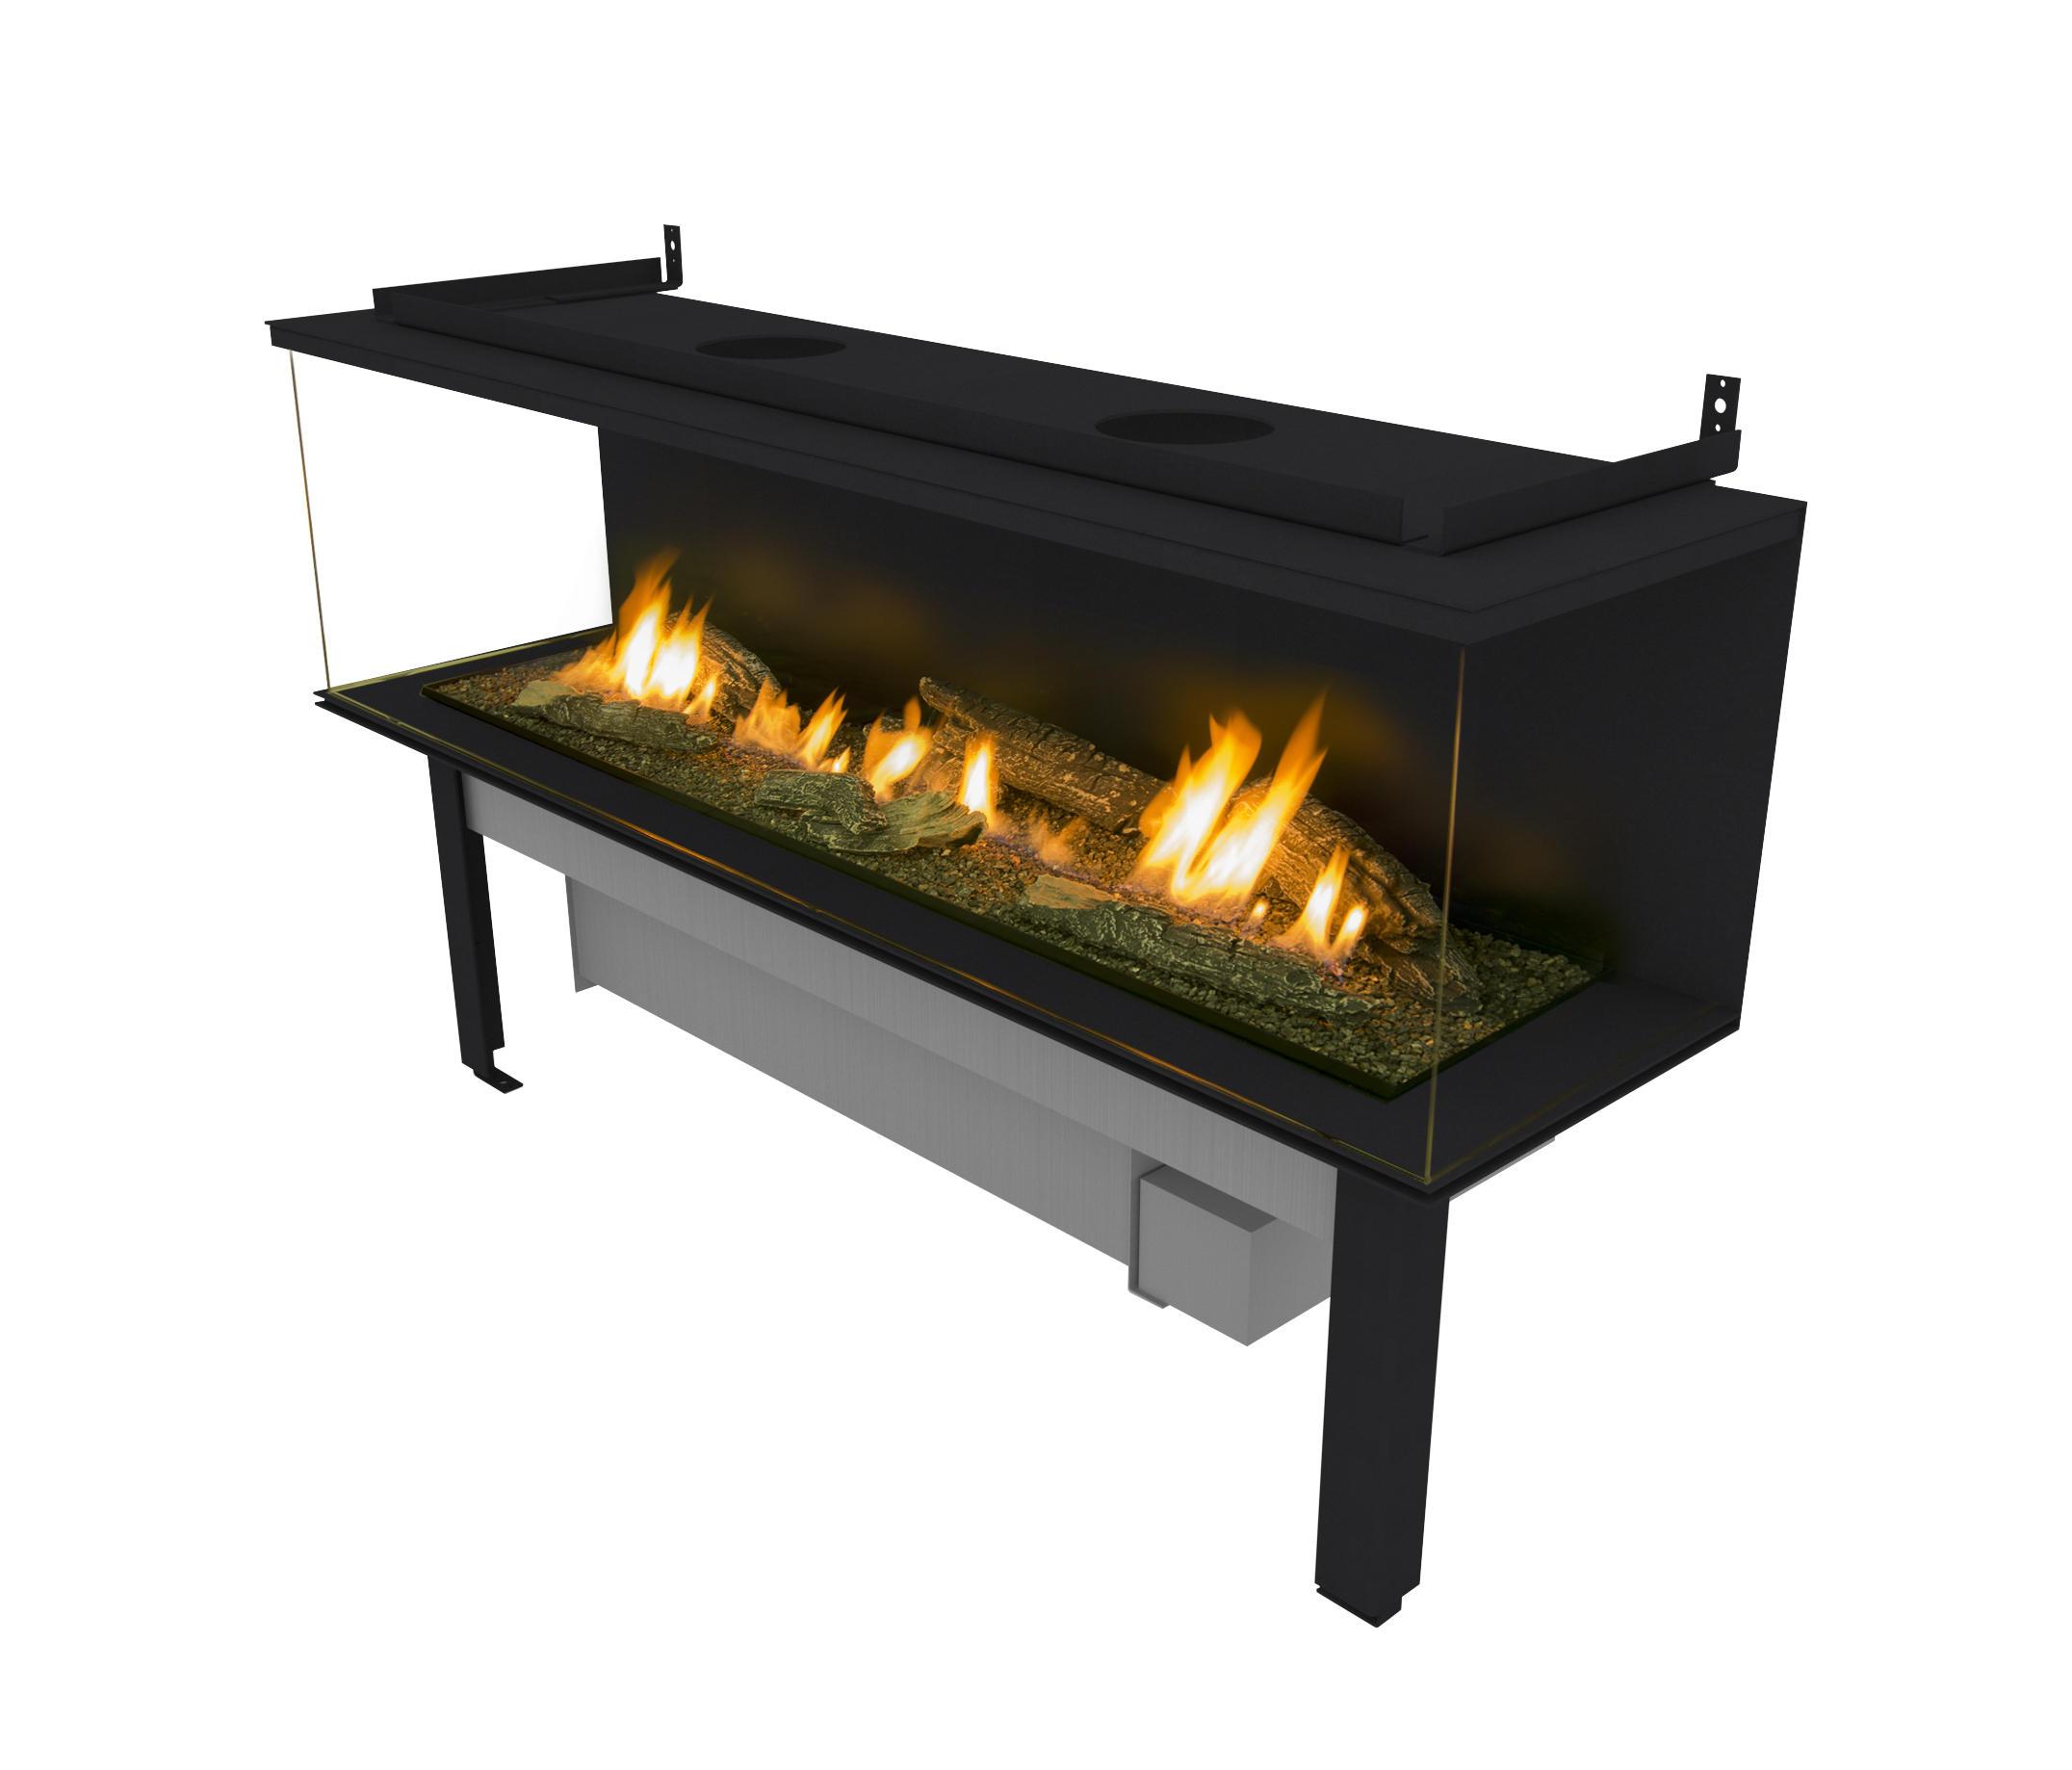 Fla 3 Xl Suite Logs Designer Furniture Architonic